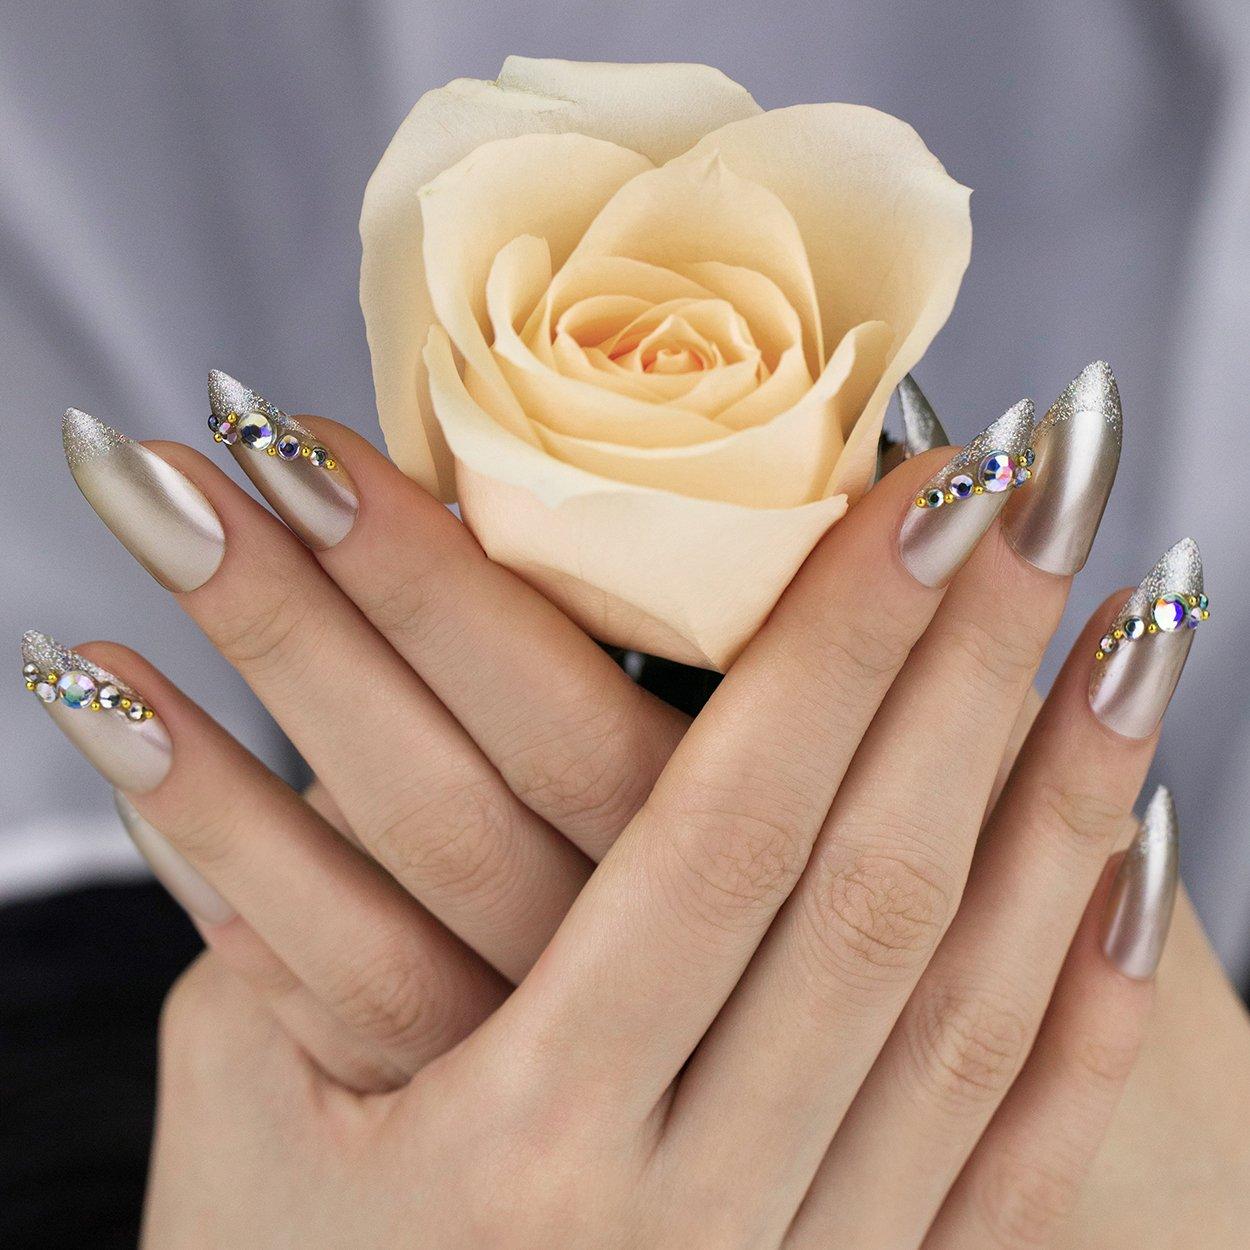 ArtPlus Diamond False Nails Kit Stiletto Bridal Silver Glitter with Crystal Full Cover with Glue 24pcs Fake Nails Art Plus